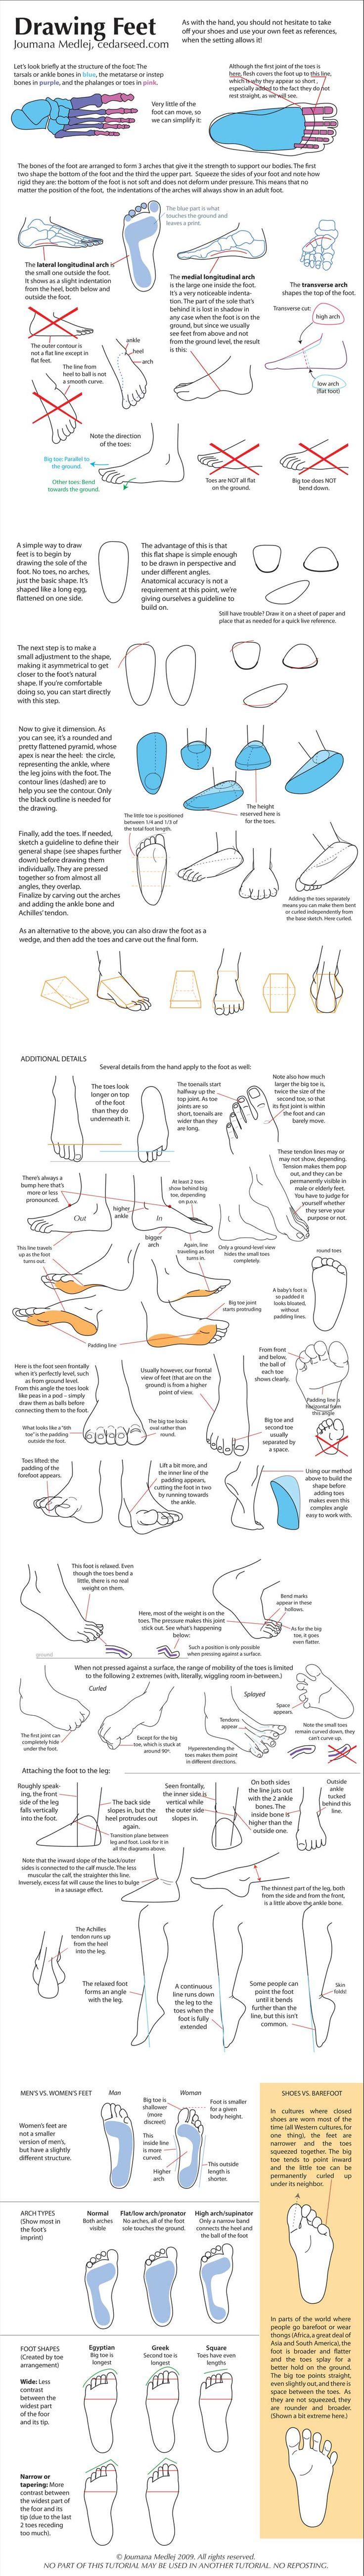 Drawing feet by Cedarseed